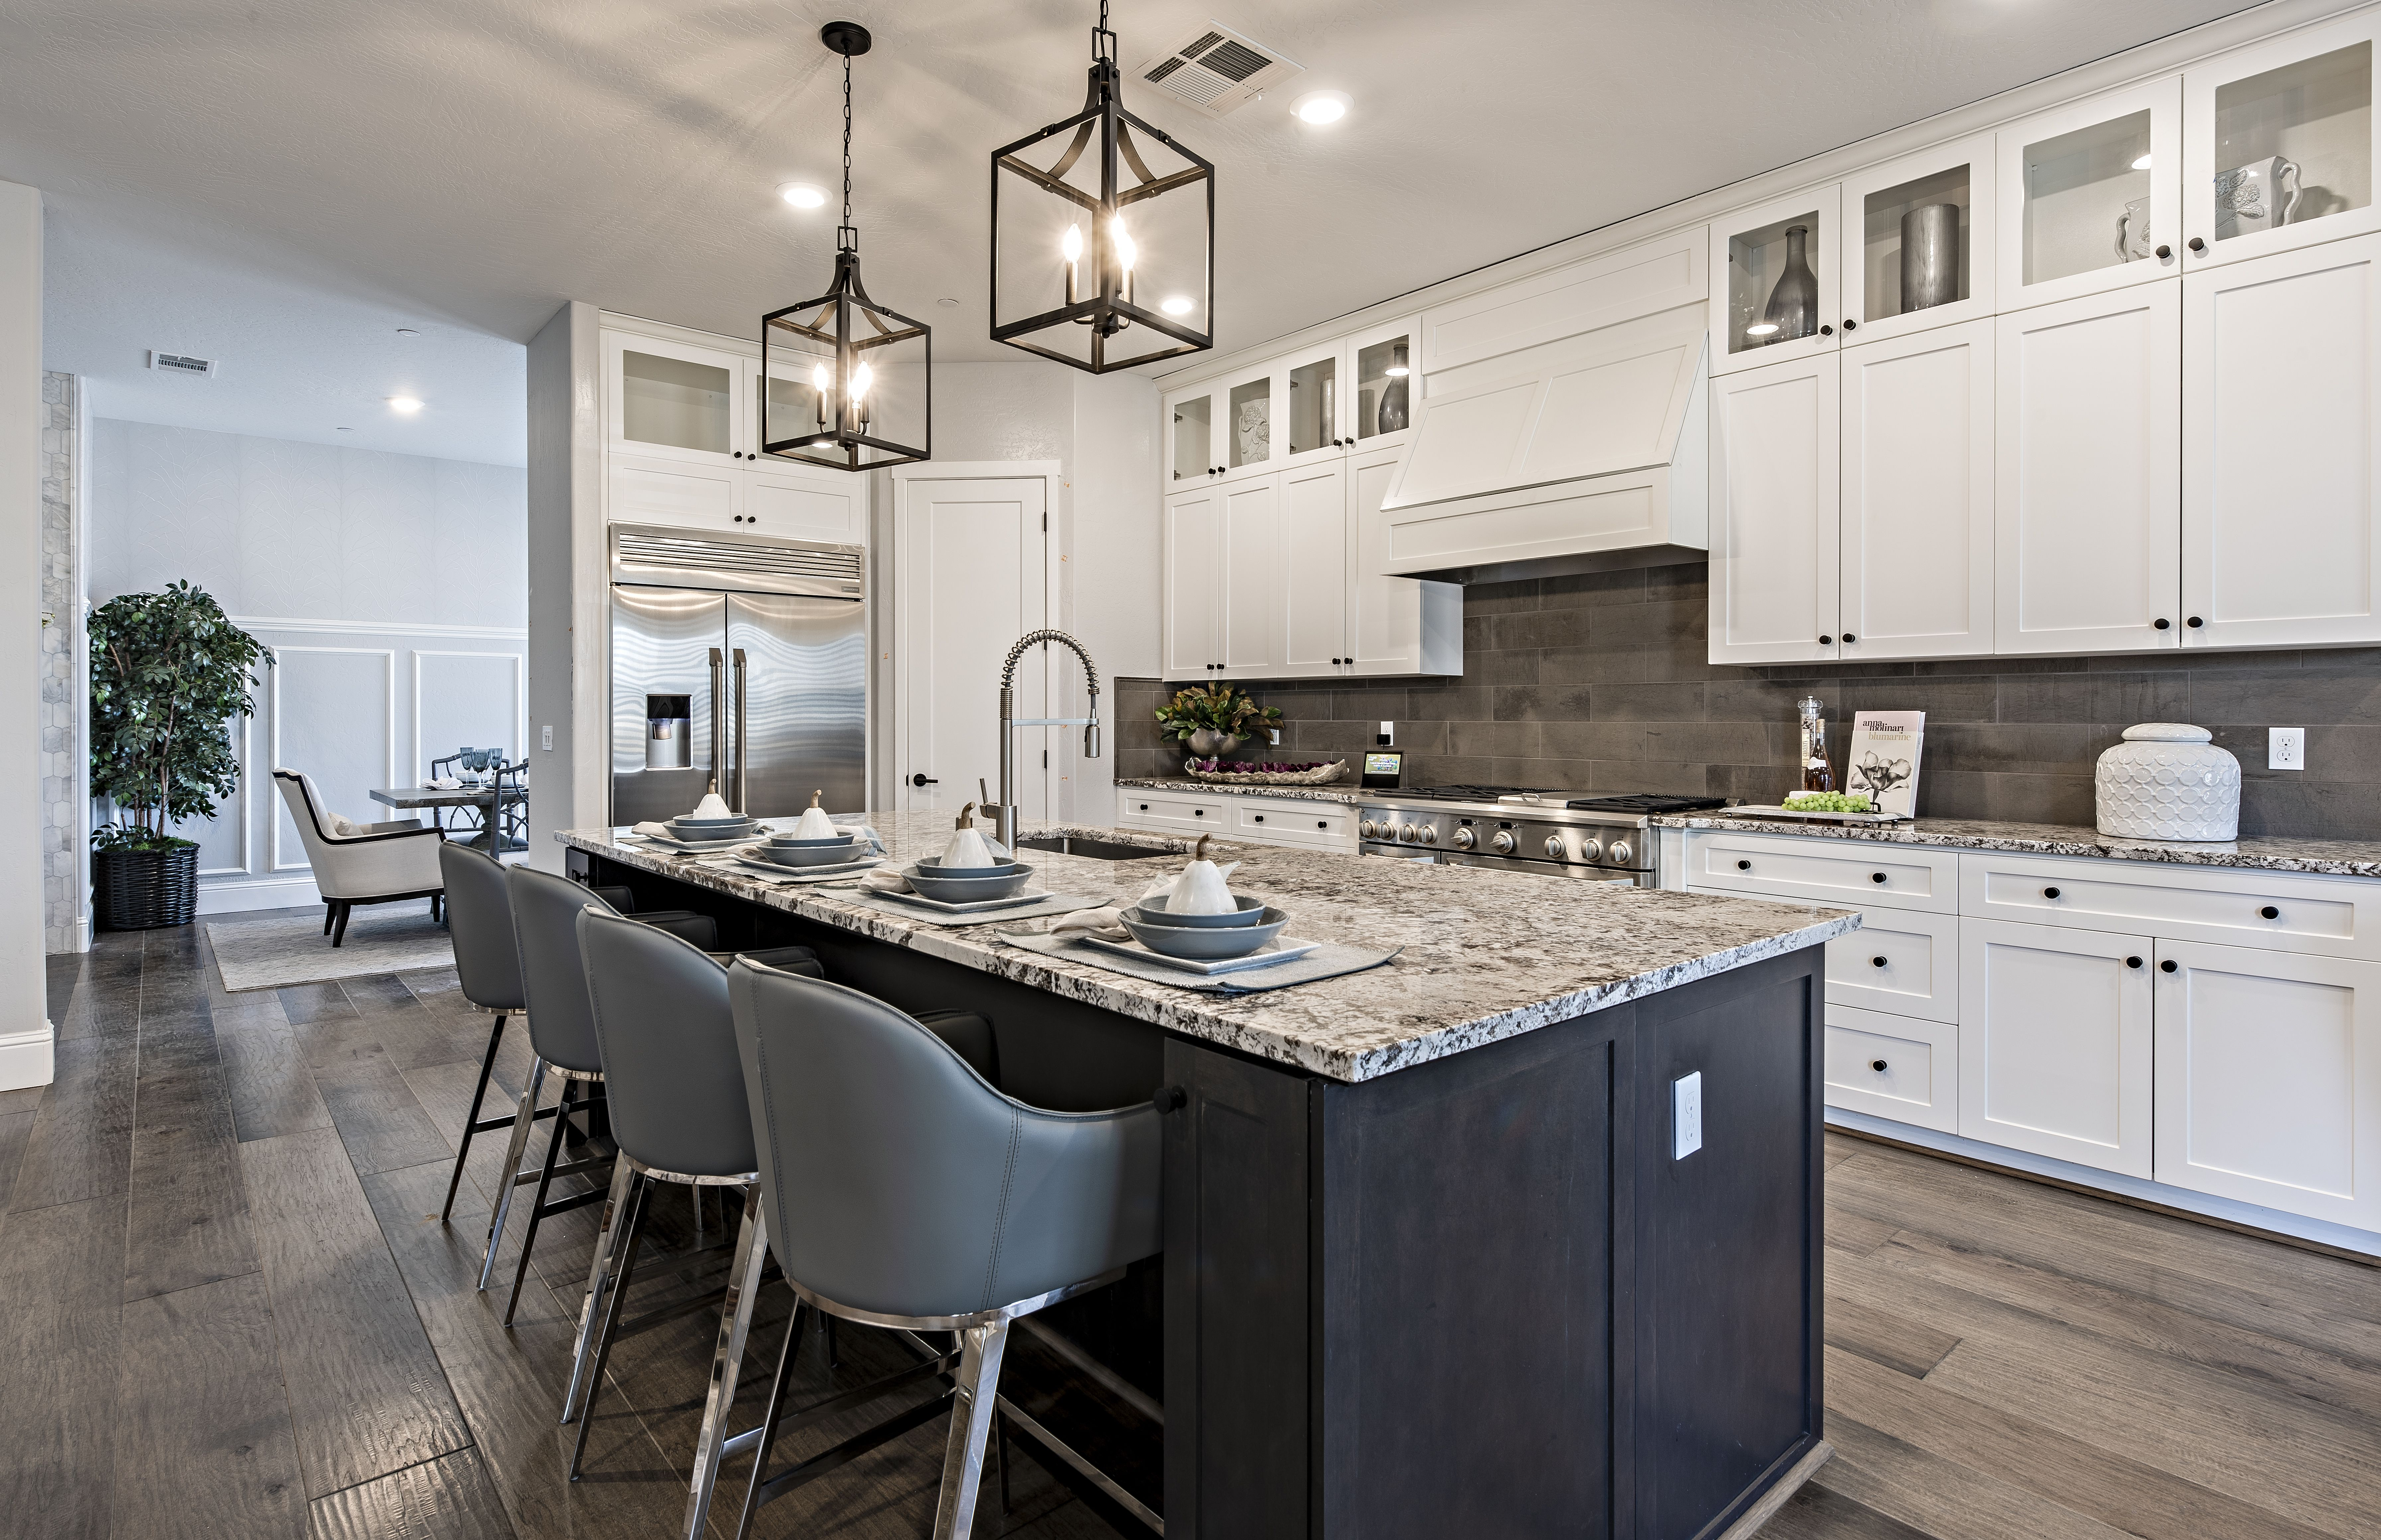 Dark Backsplash Complaining White Cabinets Looks Amazing In The Excelsior Floor Plan White Cabinets New Kitchen Kitchen Design